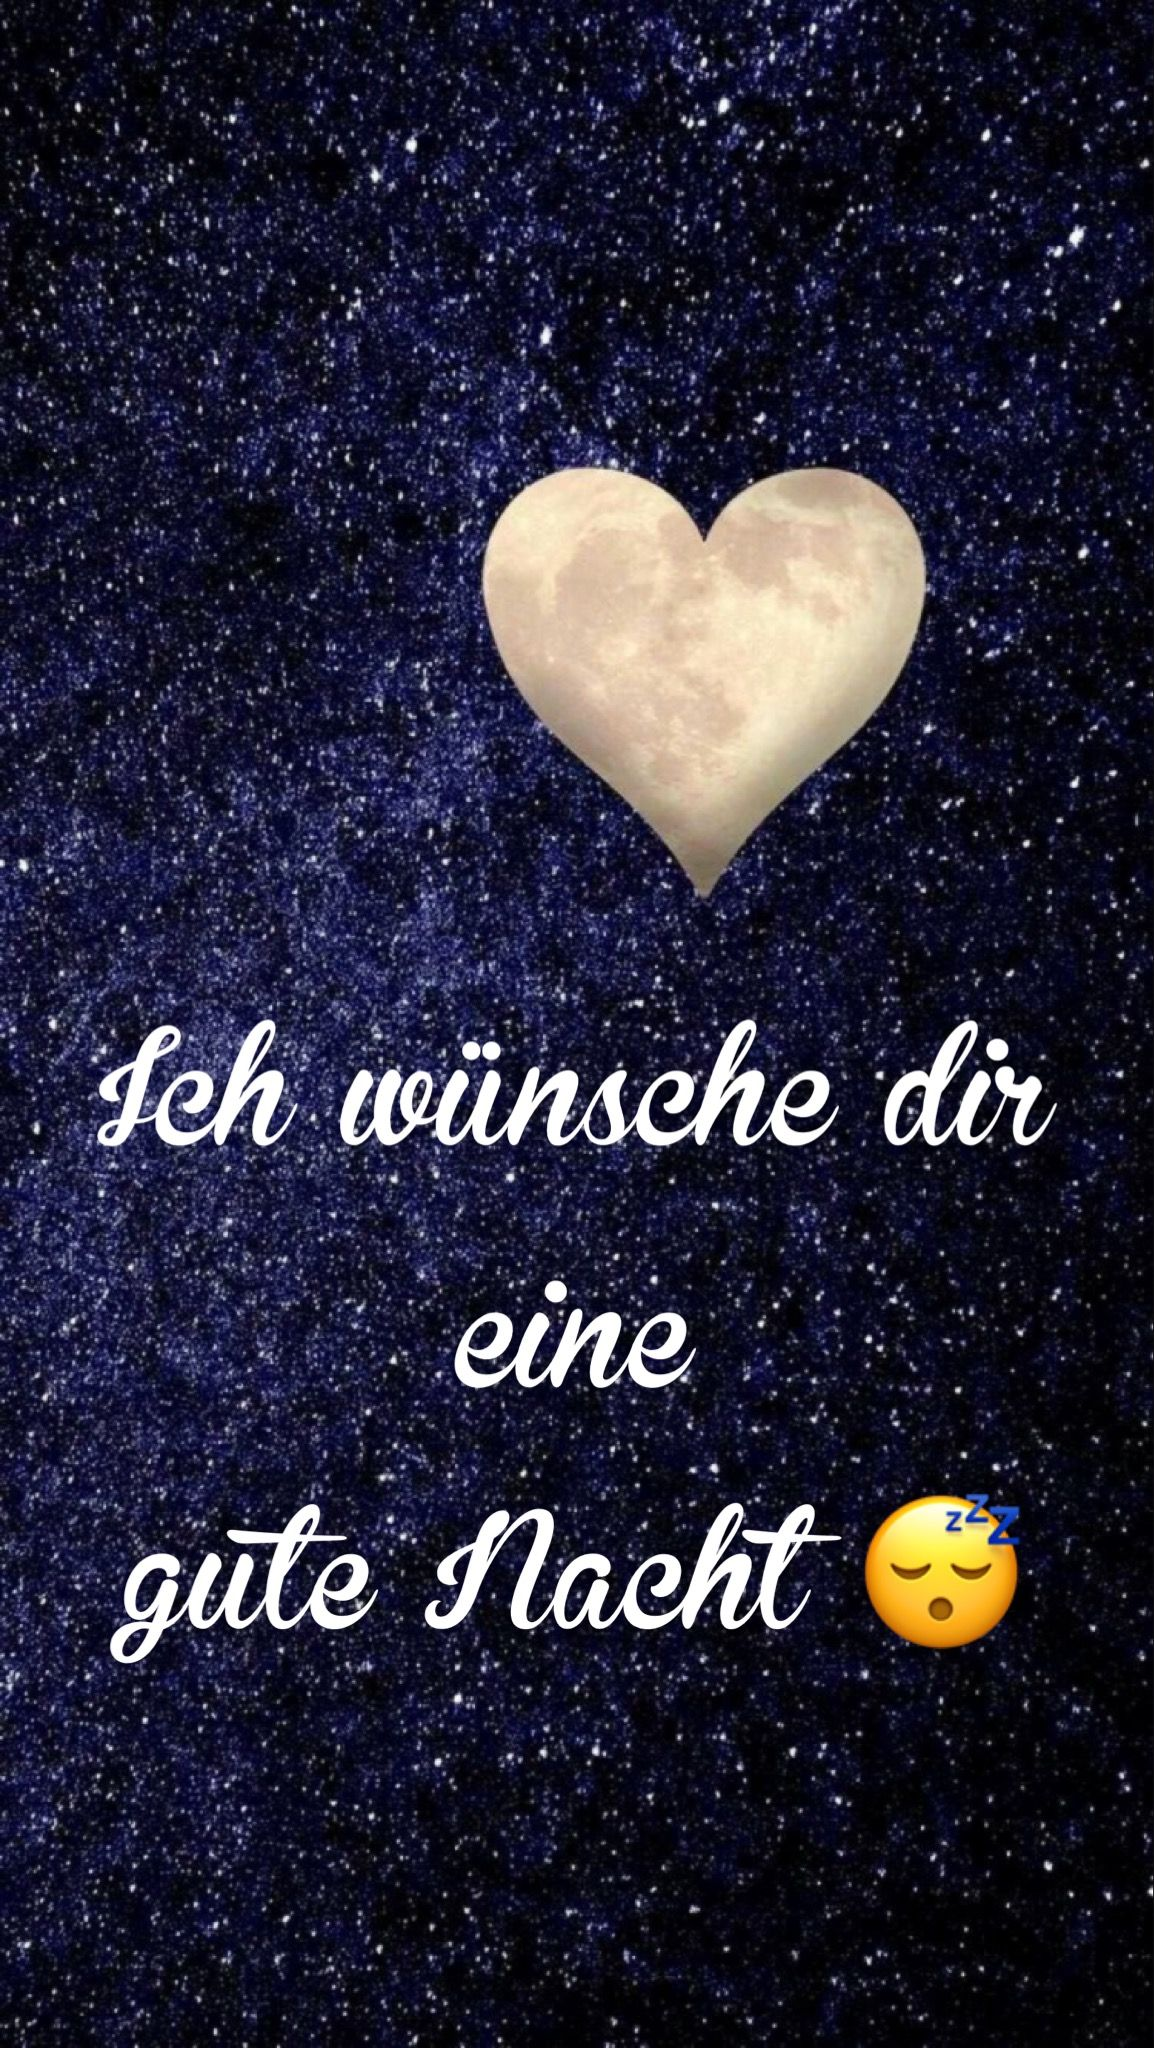 I Wish You A Good Night Liebe Gute Nacht Grusse Gute